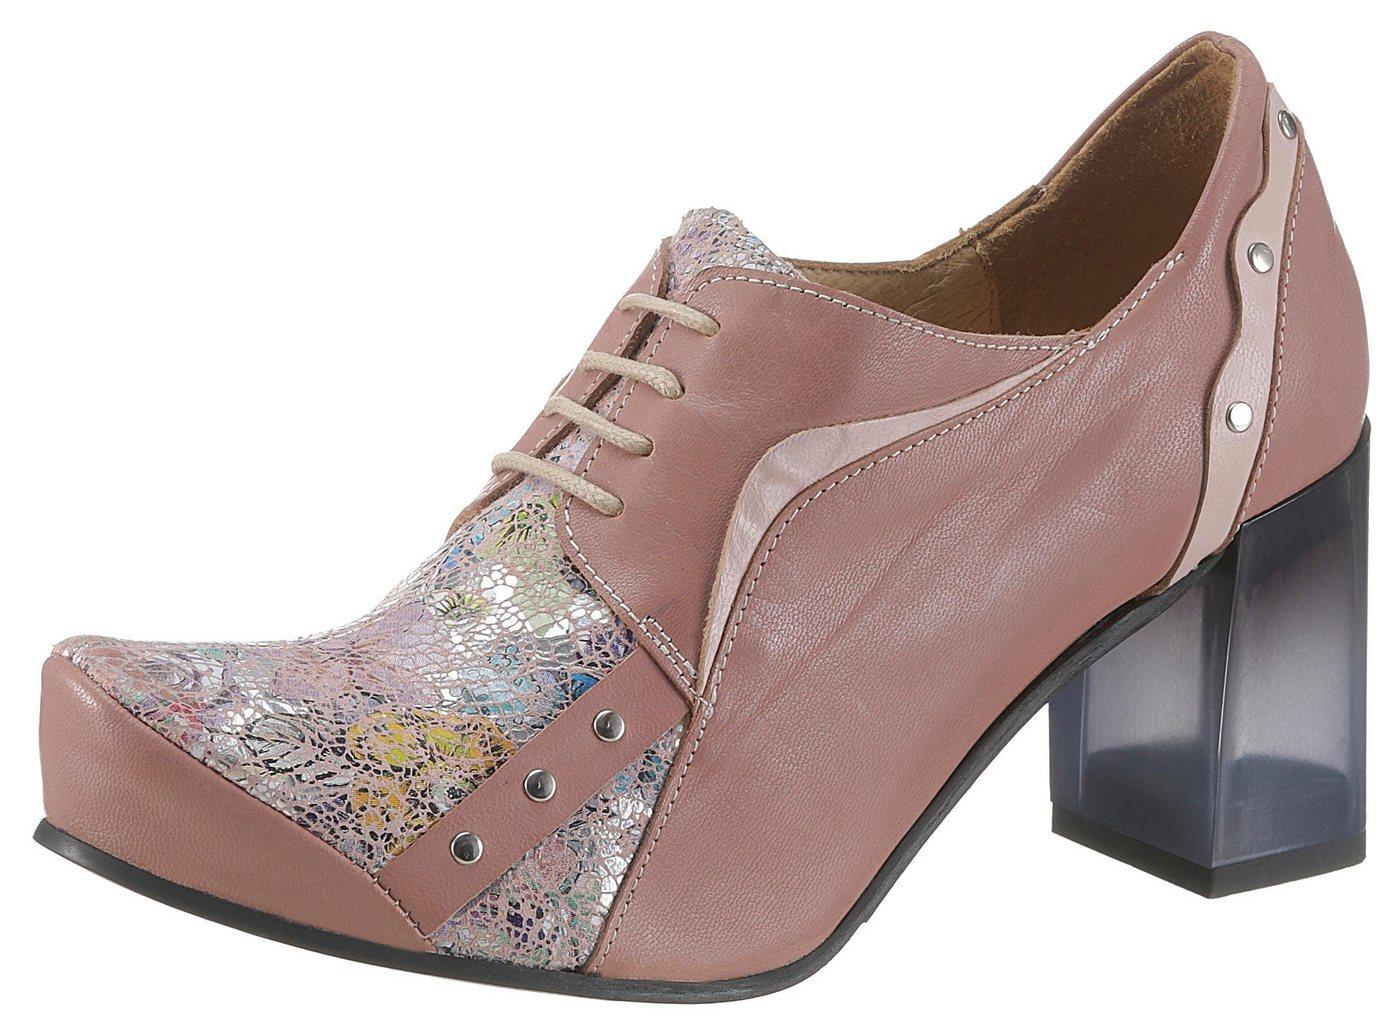 Tiggers Schnürpumps mit schimmernden Blütenprint   Schuhe > Pumps > Schnürpumps   Rosa   Leder - Gummi   Tiggers